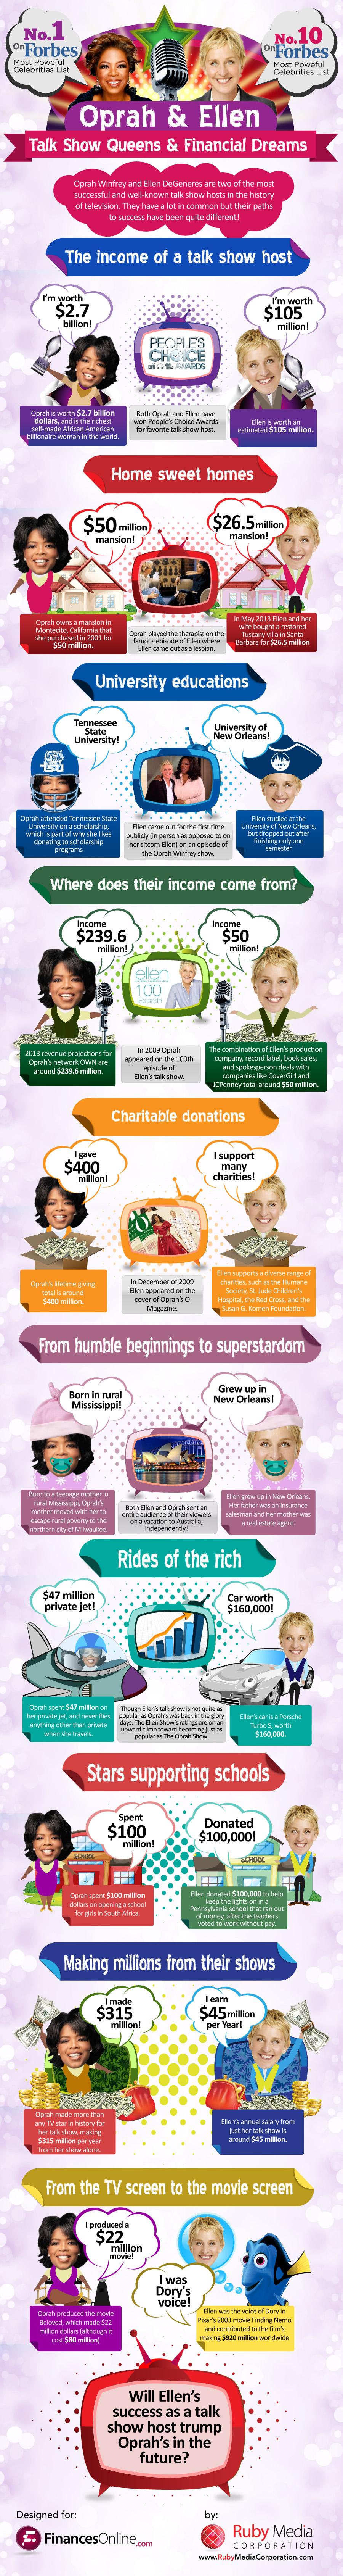 oprah-ellen-infographic